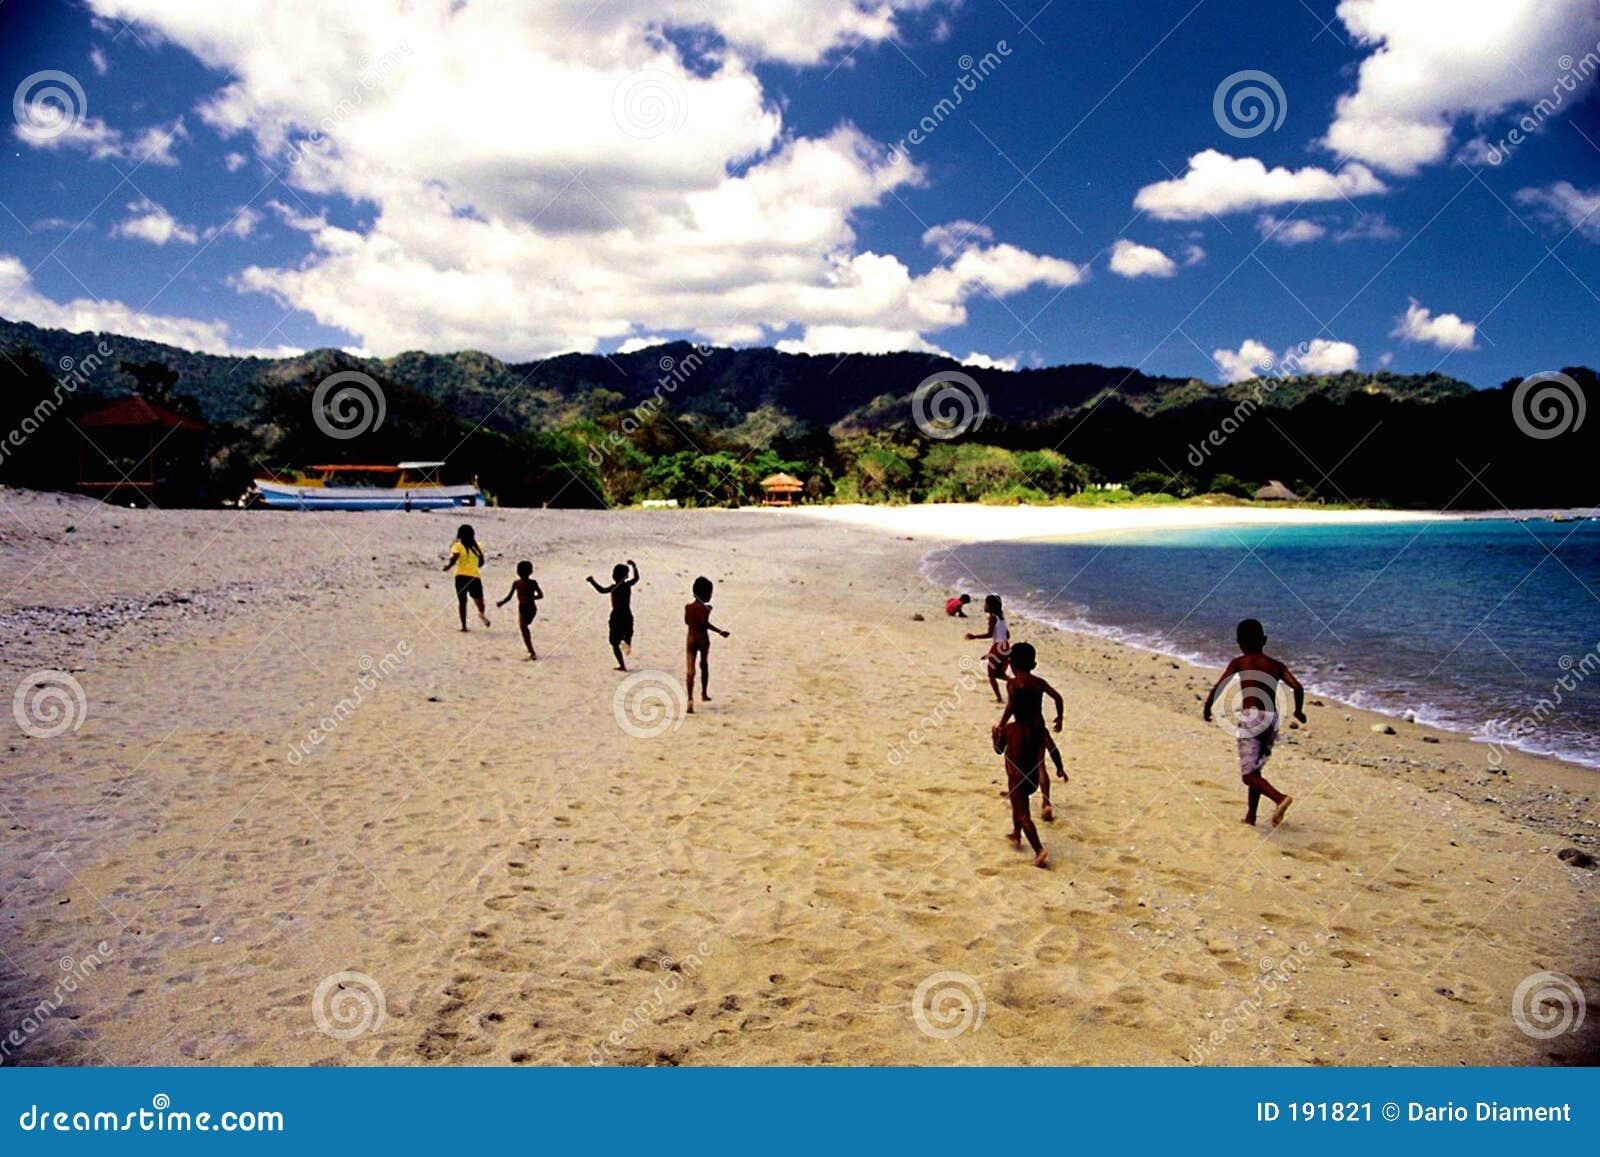 Kids Running On The Beach